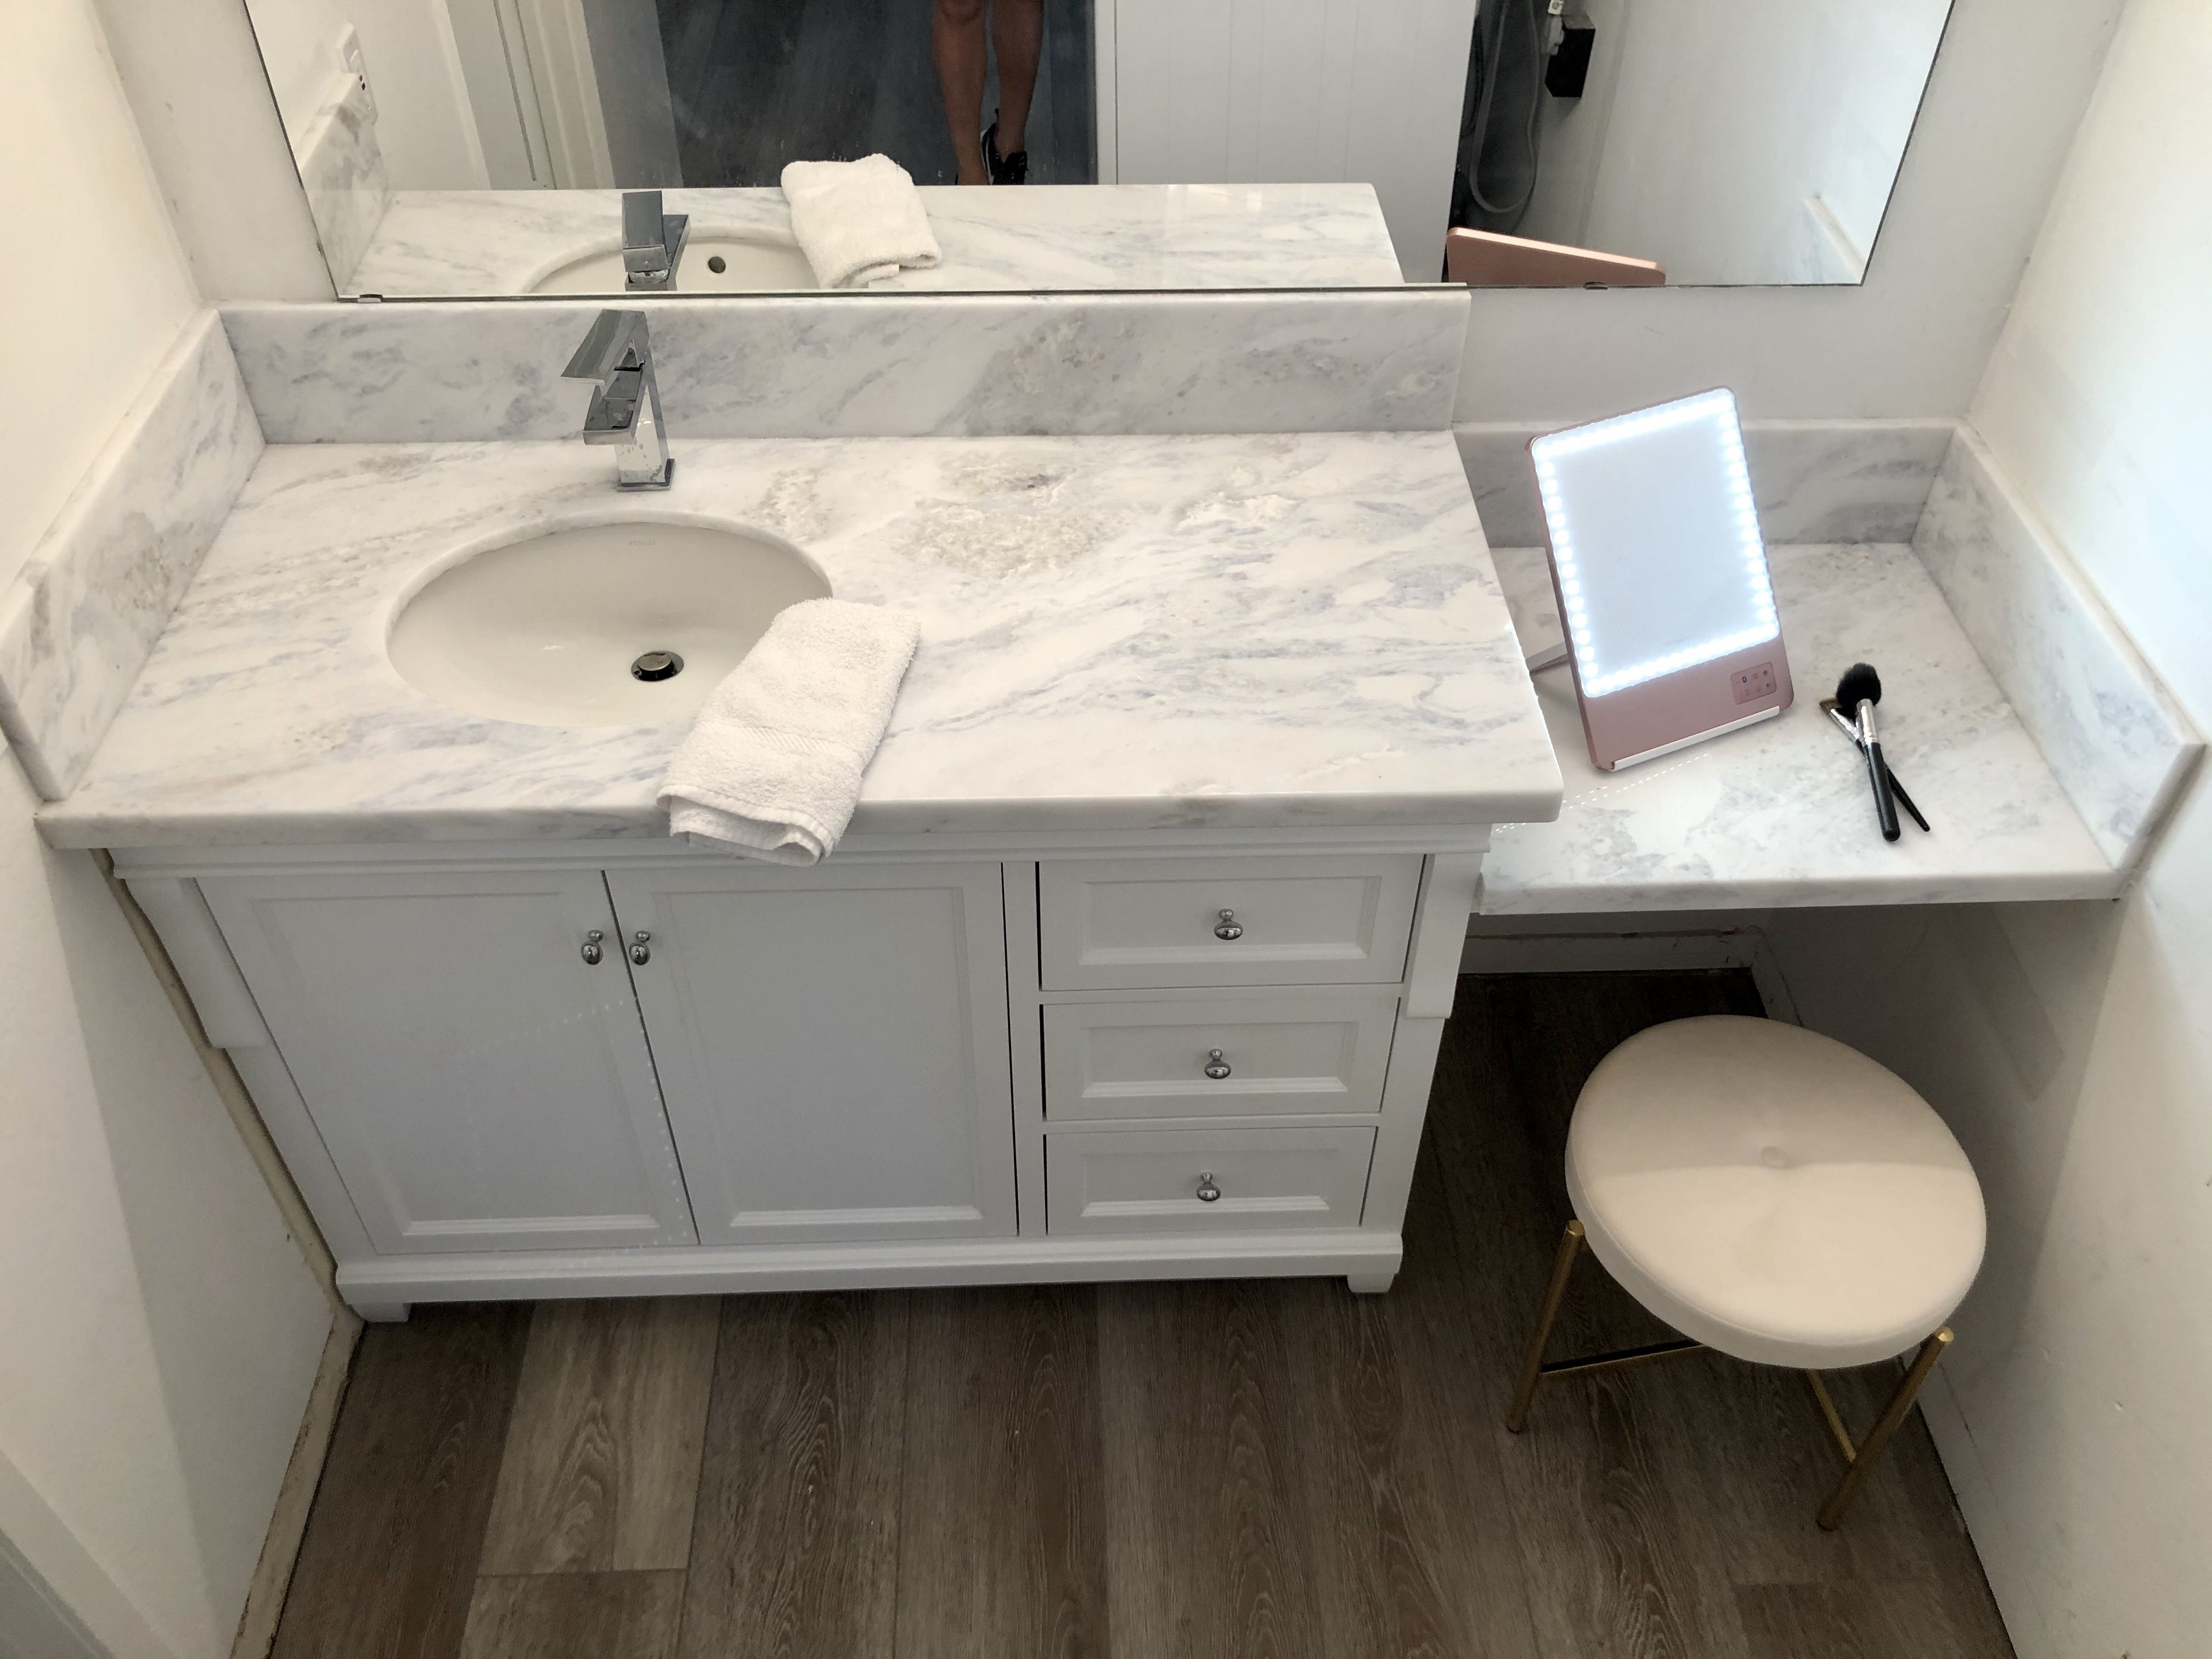 Home Decorators Collection Naples 48 In W Bath Vanity Cabinet Only In White Nawa4821d The Home Depot Small Bathroom Vanities Custom Bathroom Vanity Master Bathroom Vanity [ 3024 x 4032 Pixel ]